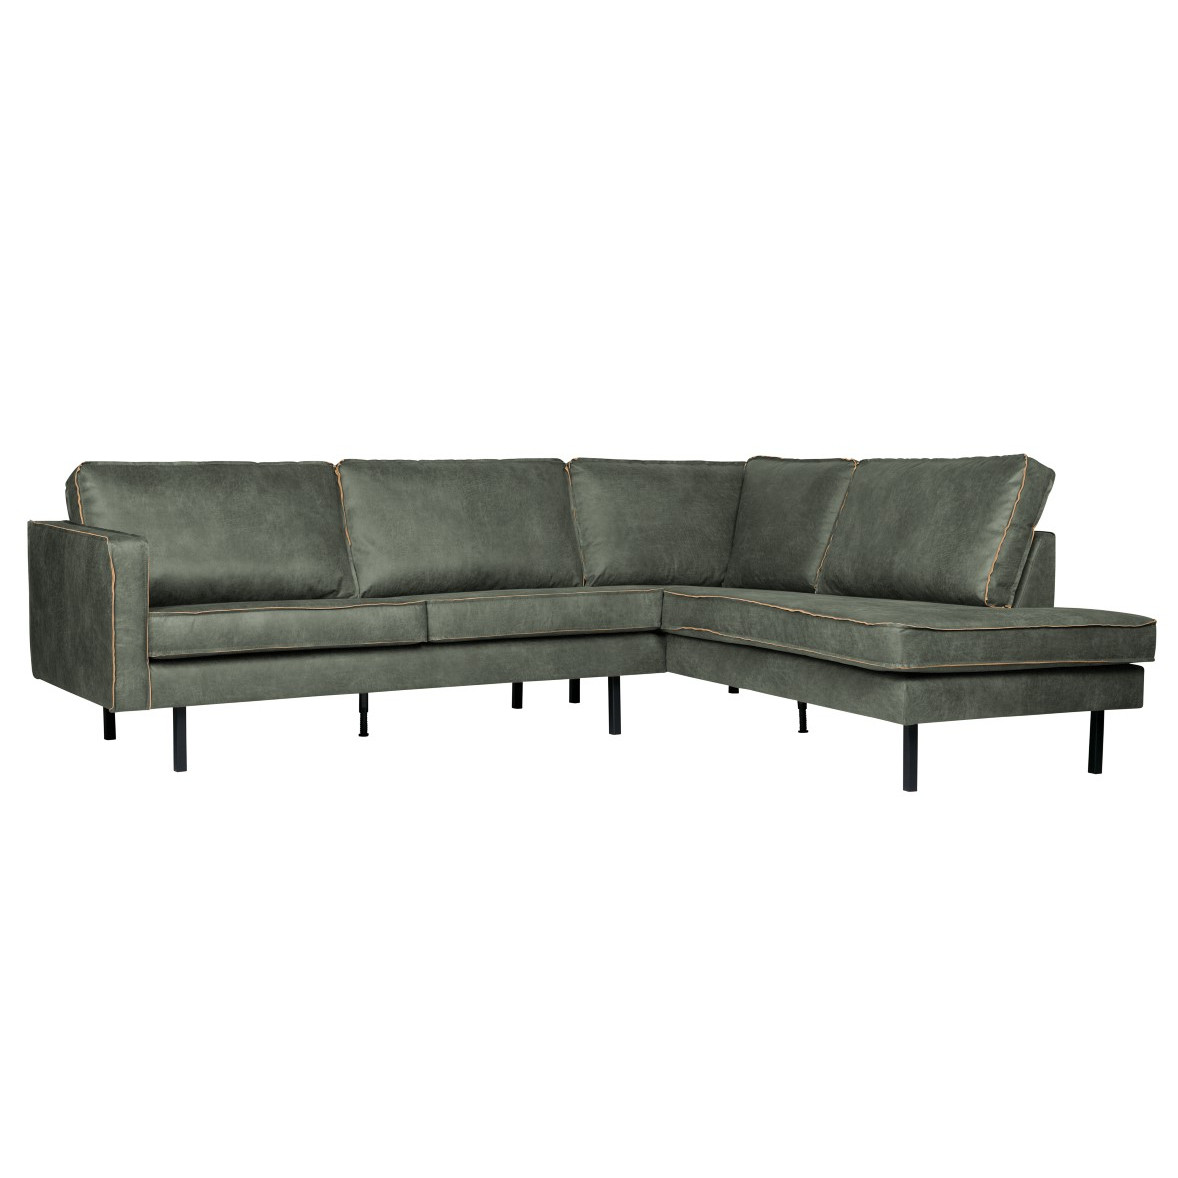 Right Corner Sofa Rodeo | Army Green